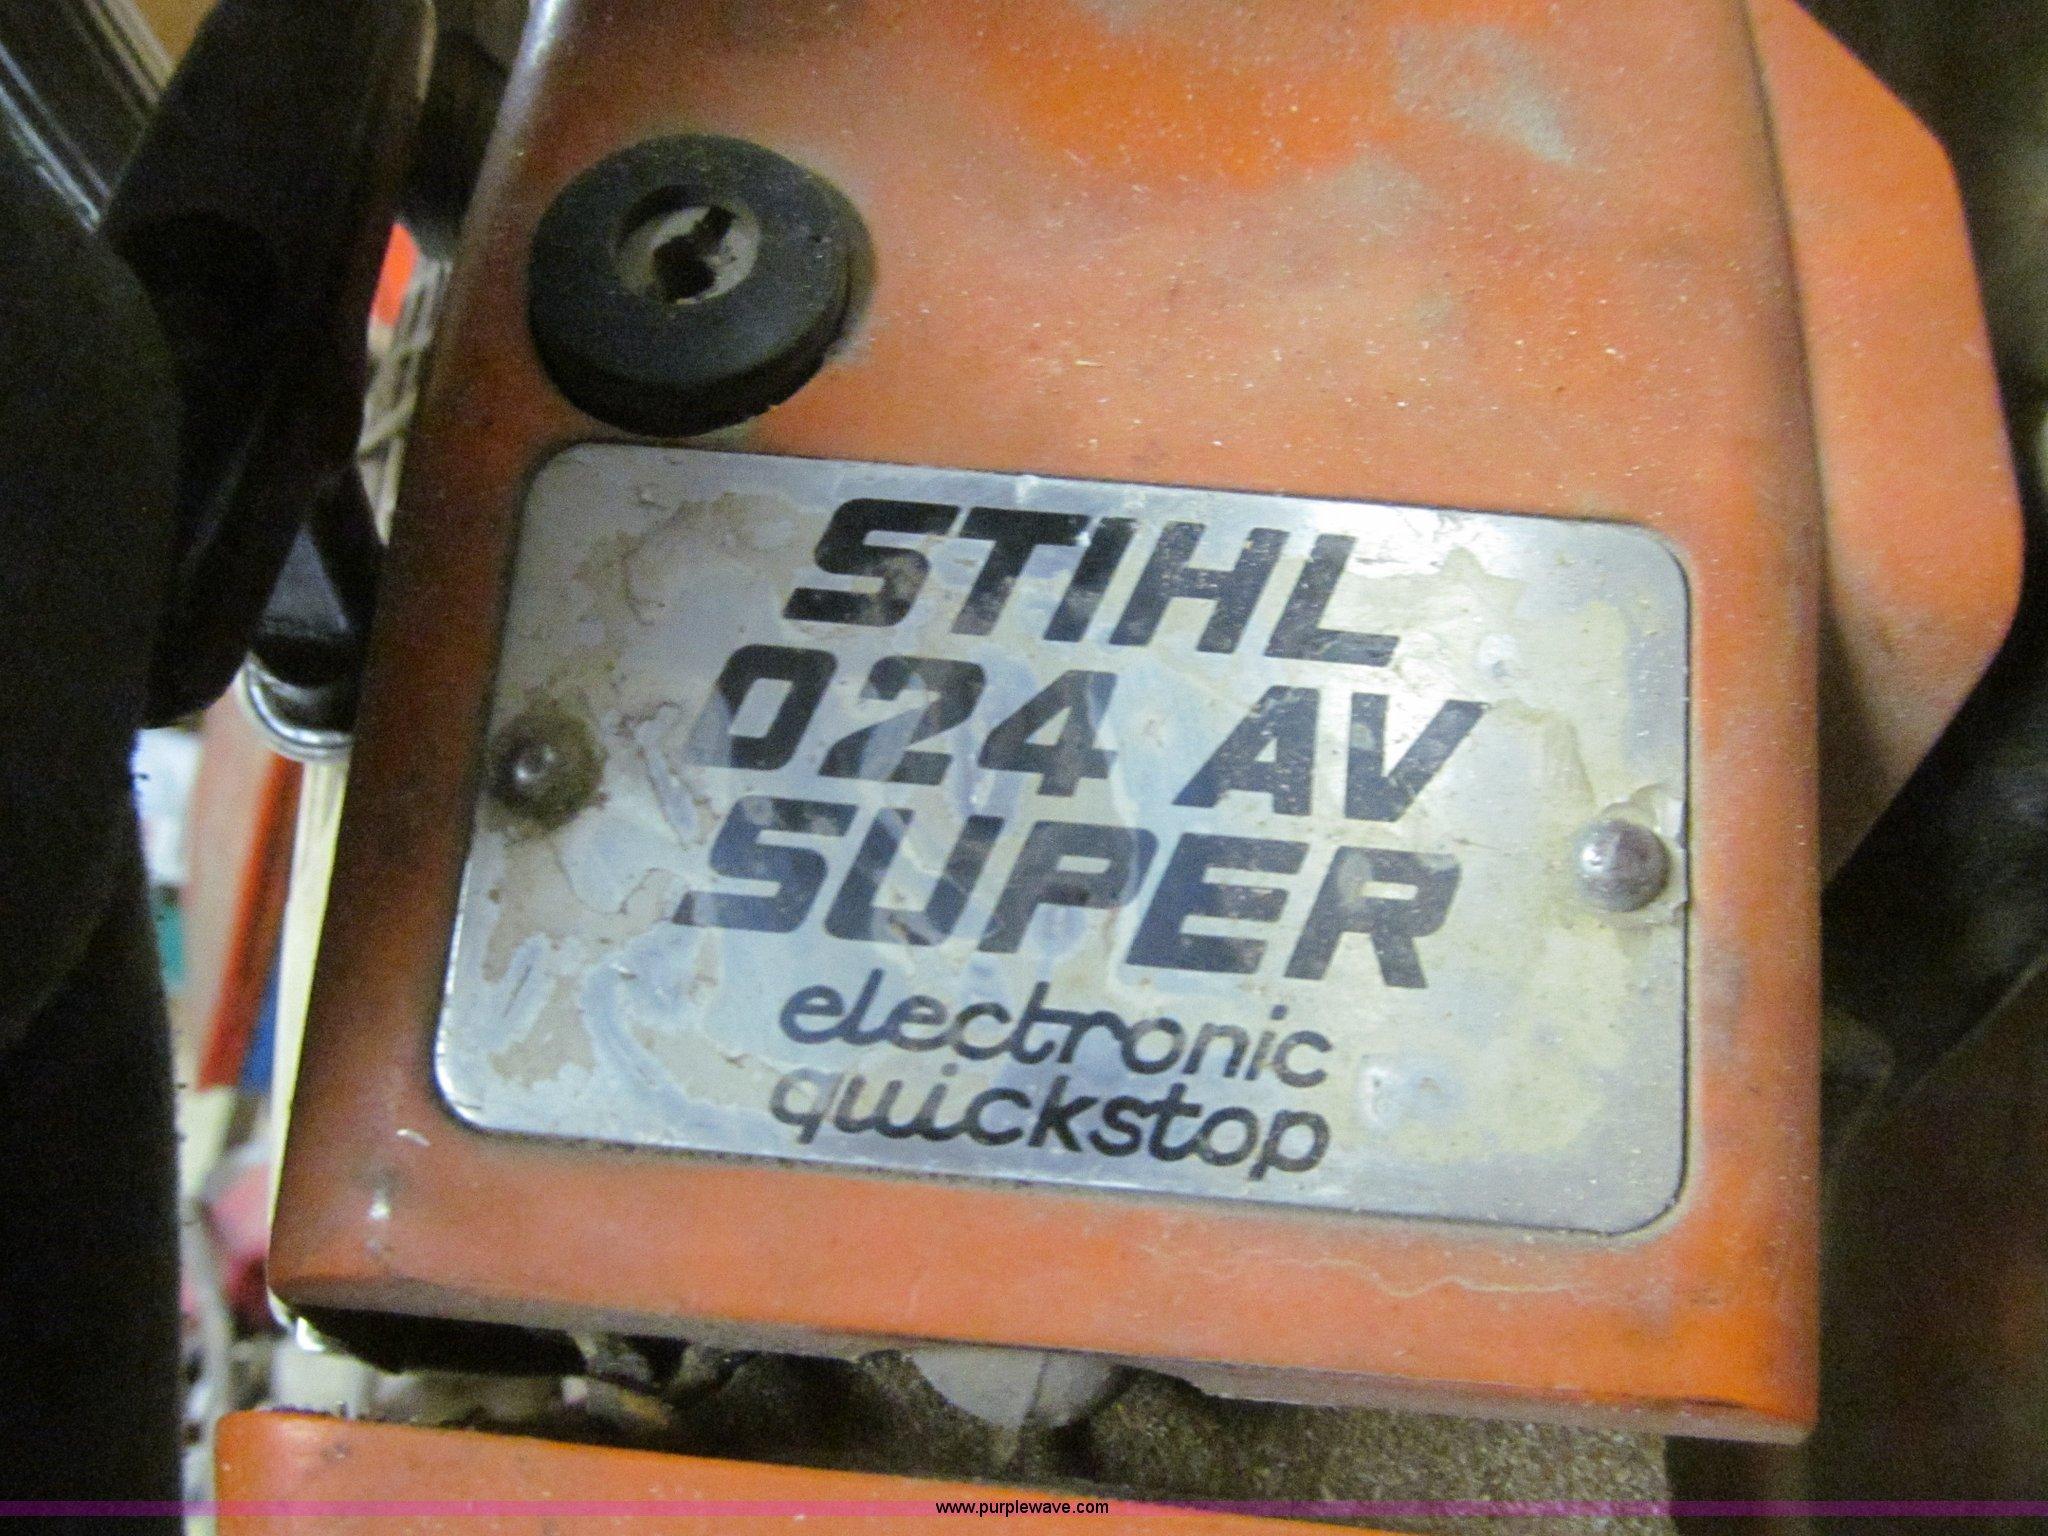 Stihl 024 AV chainsaw   Item E4786   SOLD! May 29 Kemp and S